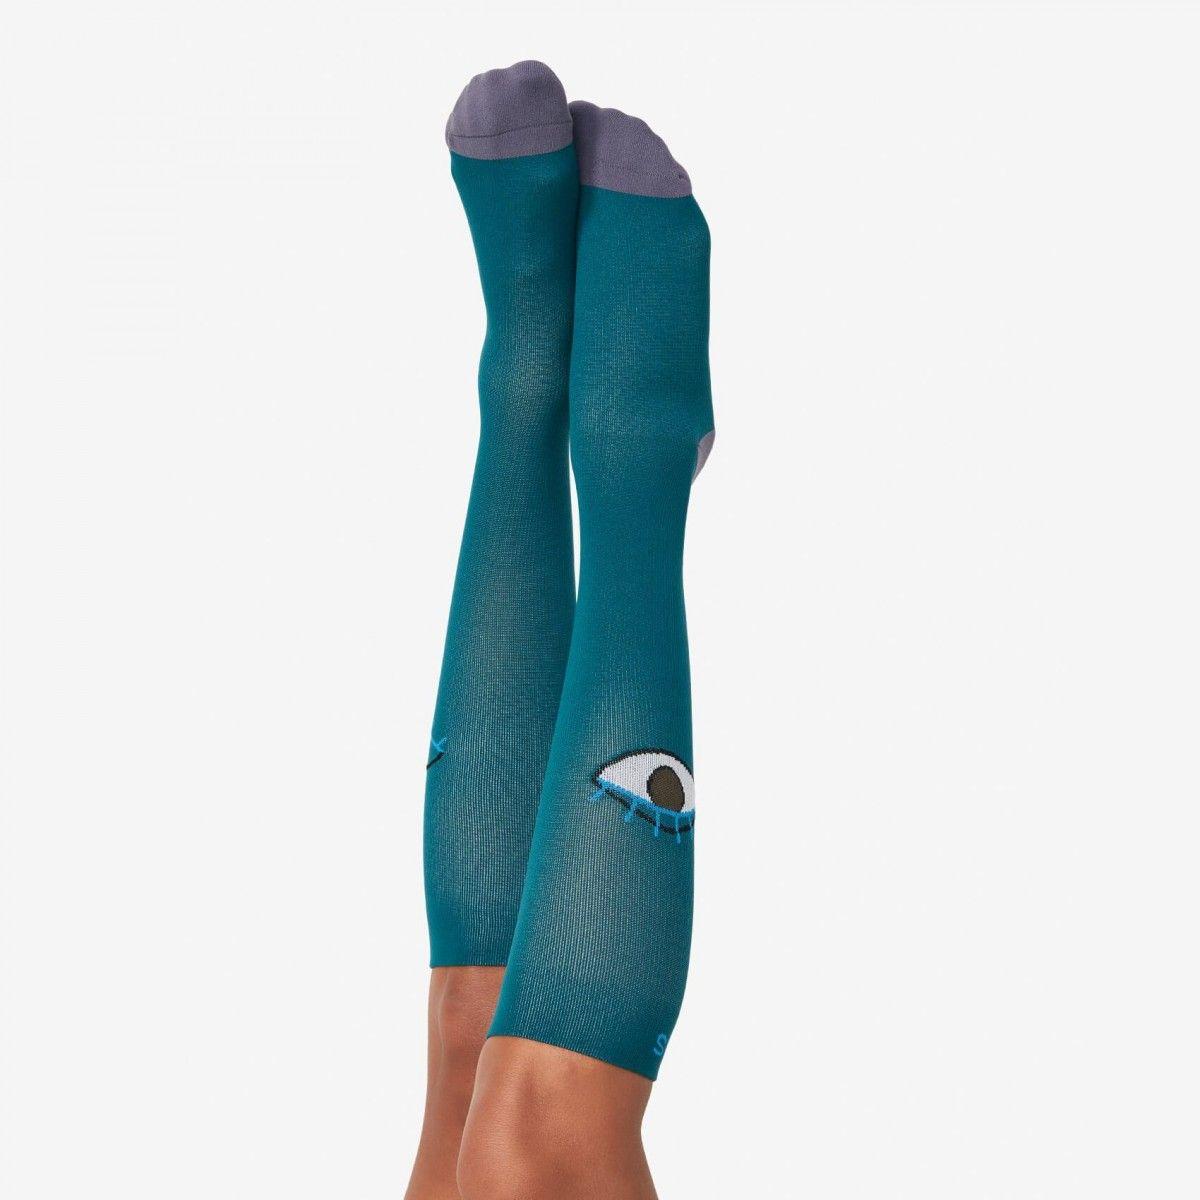 Womens Compression Socks Eyes Womens compression socks